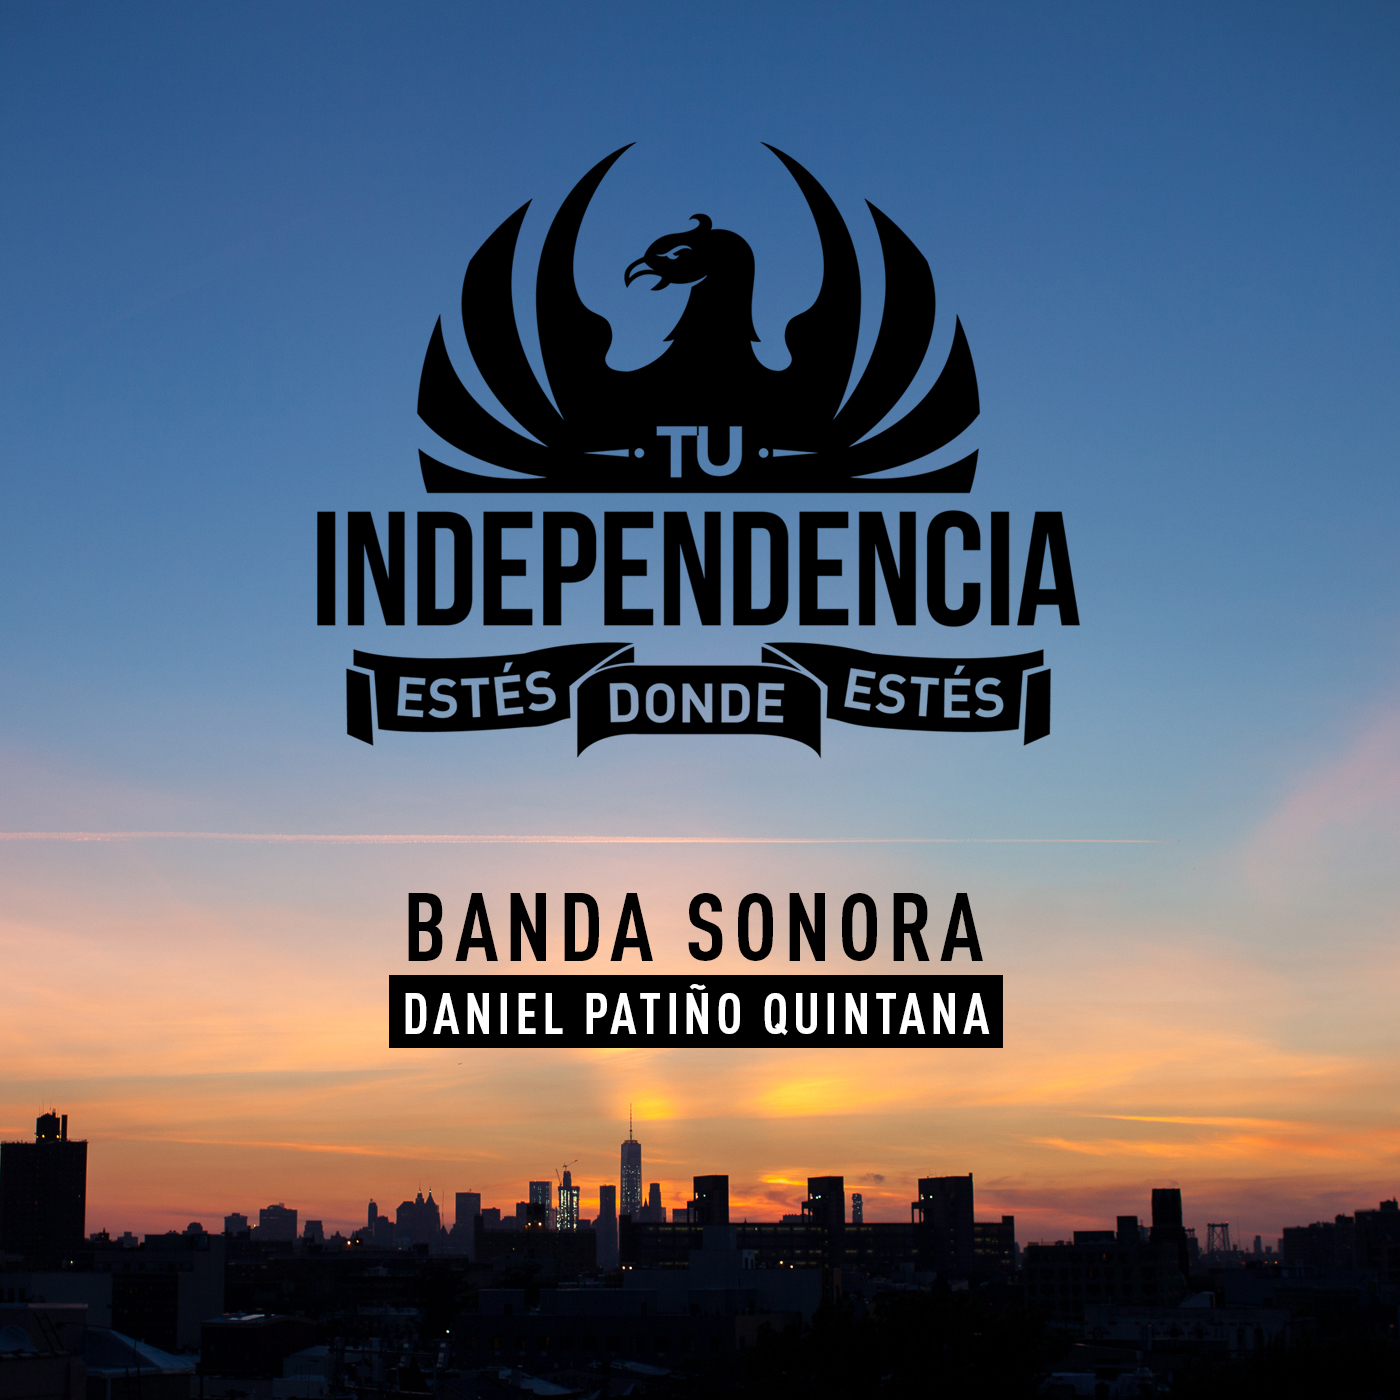 tuindependencia-bandasonora-cover.jpg